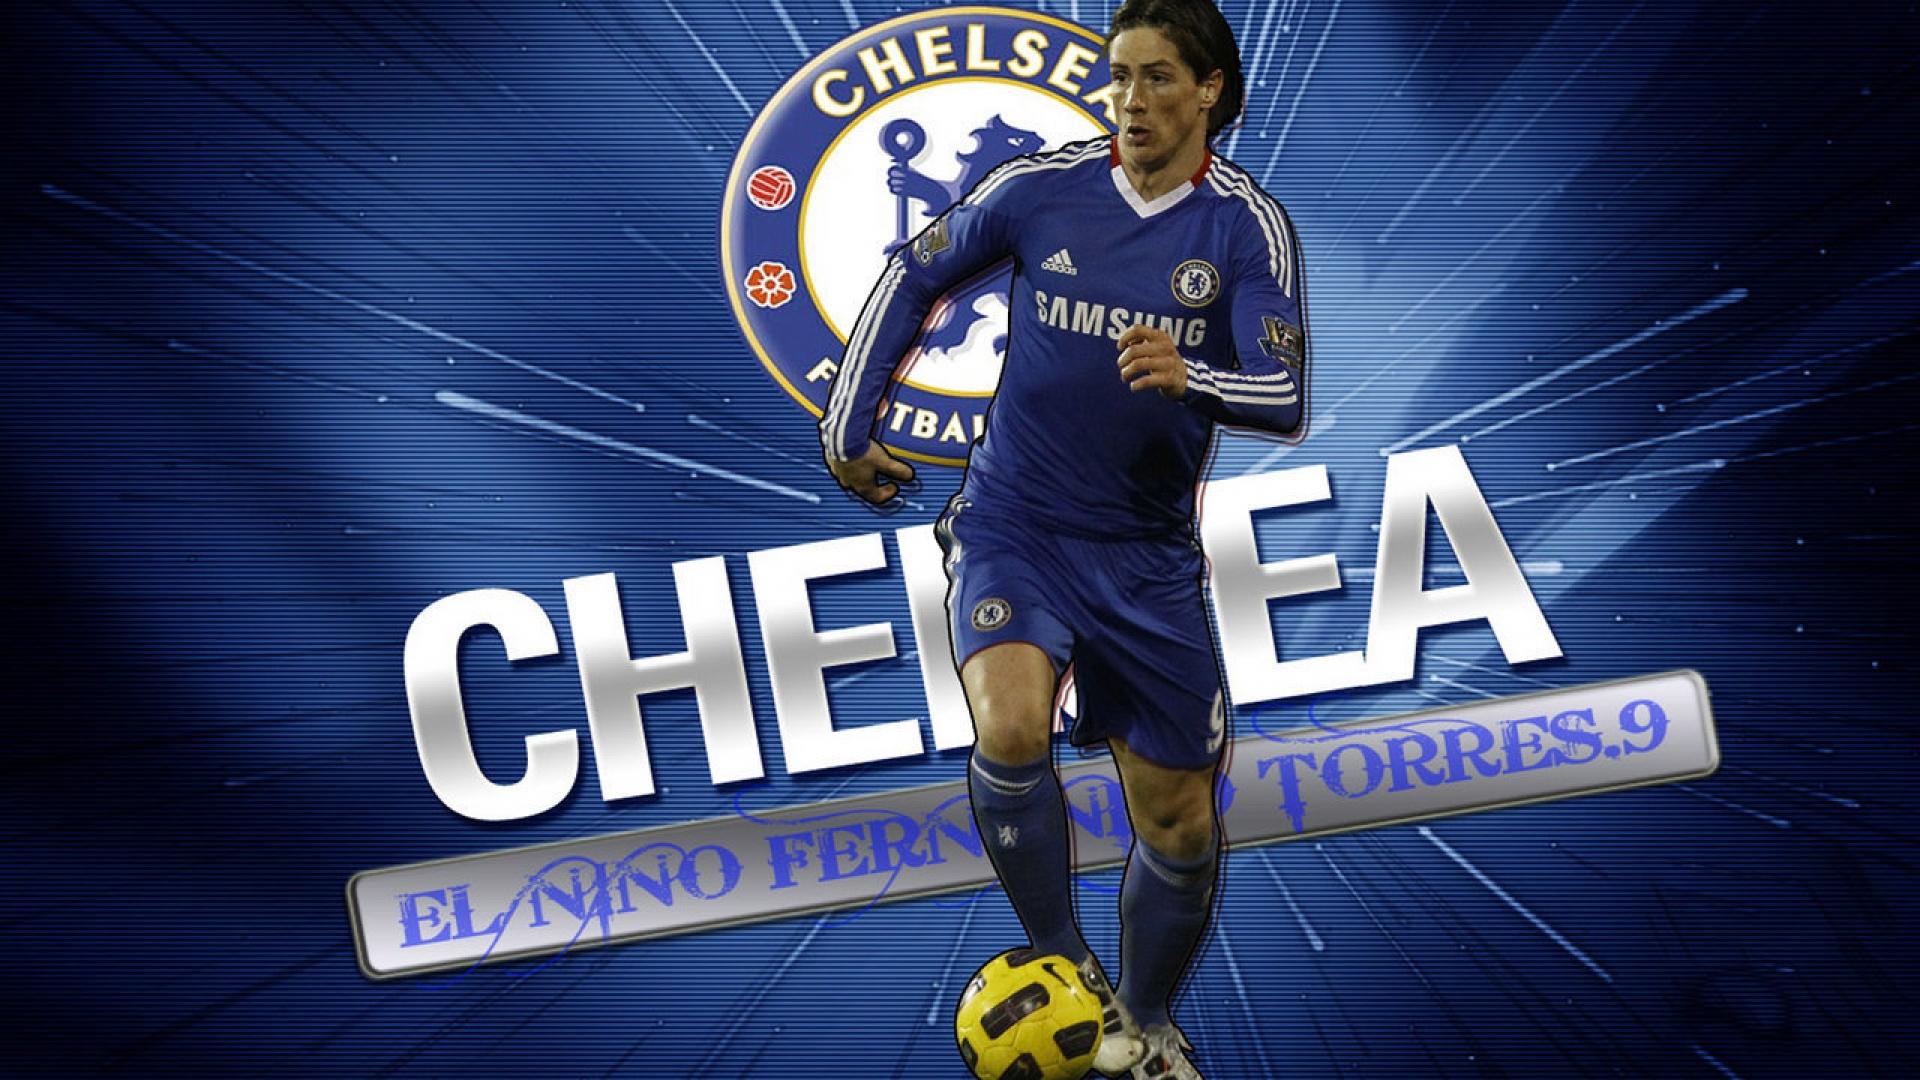 Chelsea-Wallpaper-Football